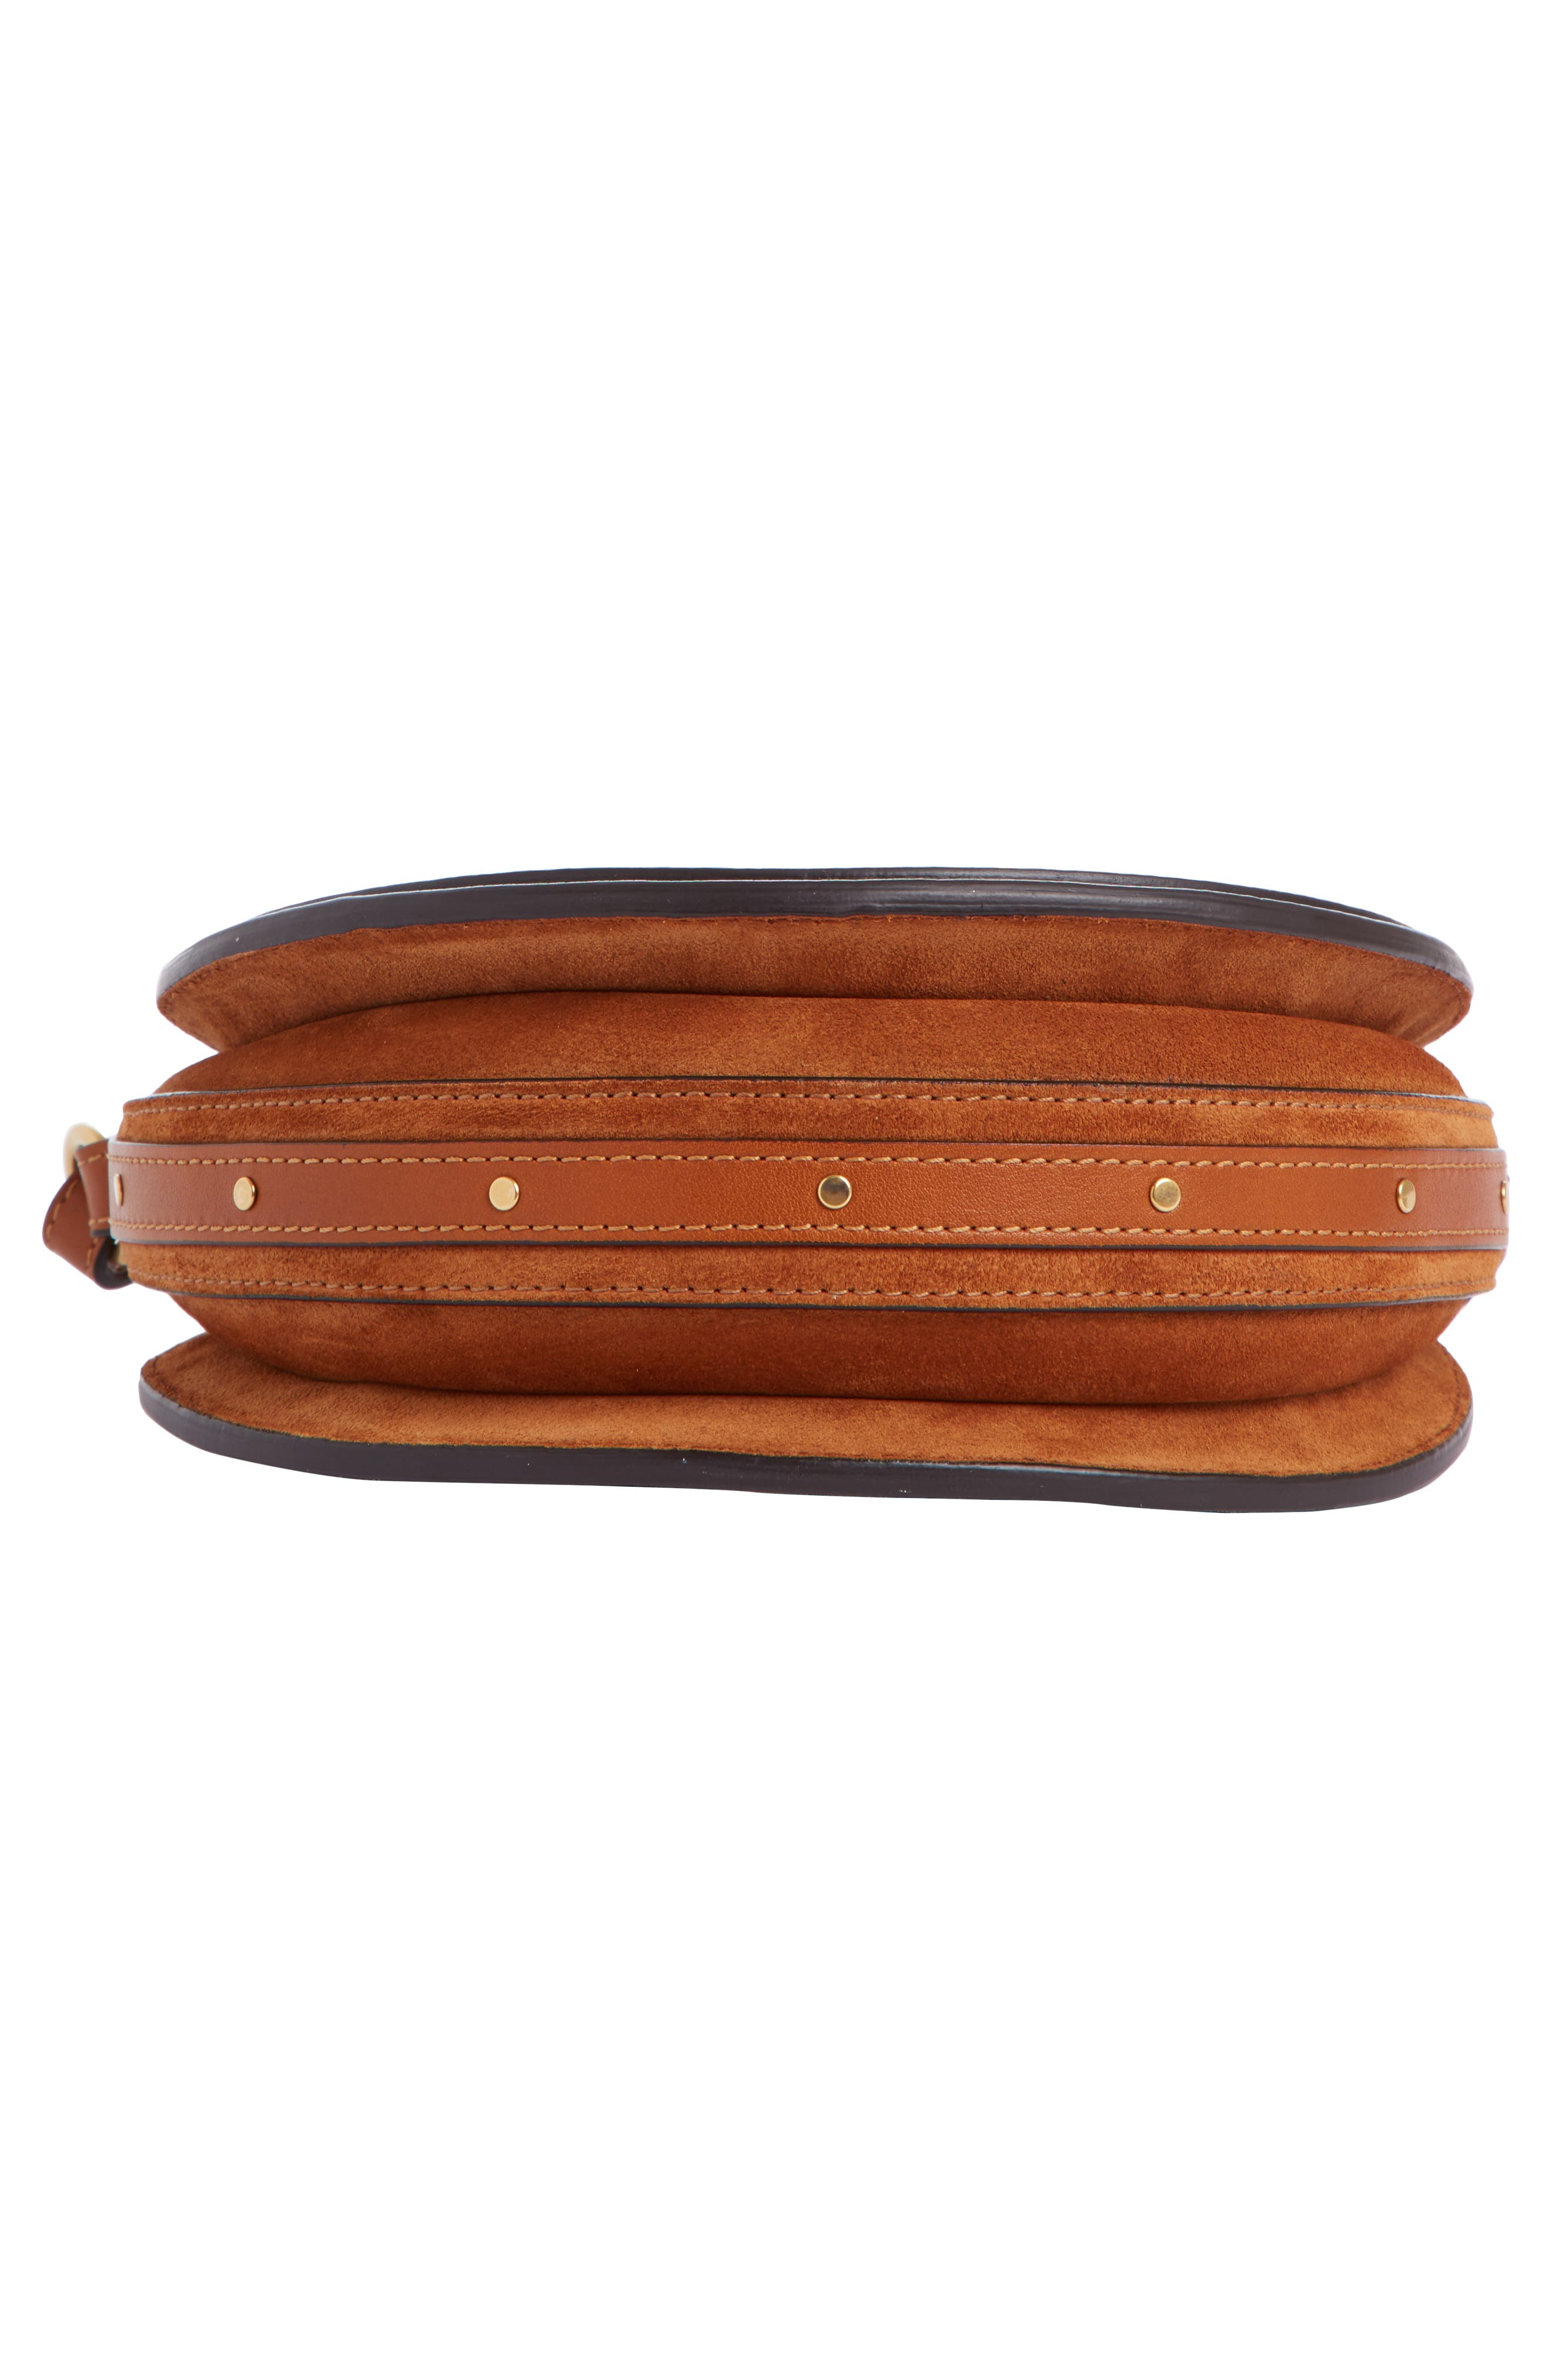 Pixie Leather Crossbody Bag,                             Alternate thumbnail 4, color,                             Saffron Red